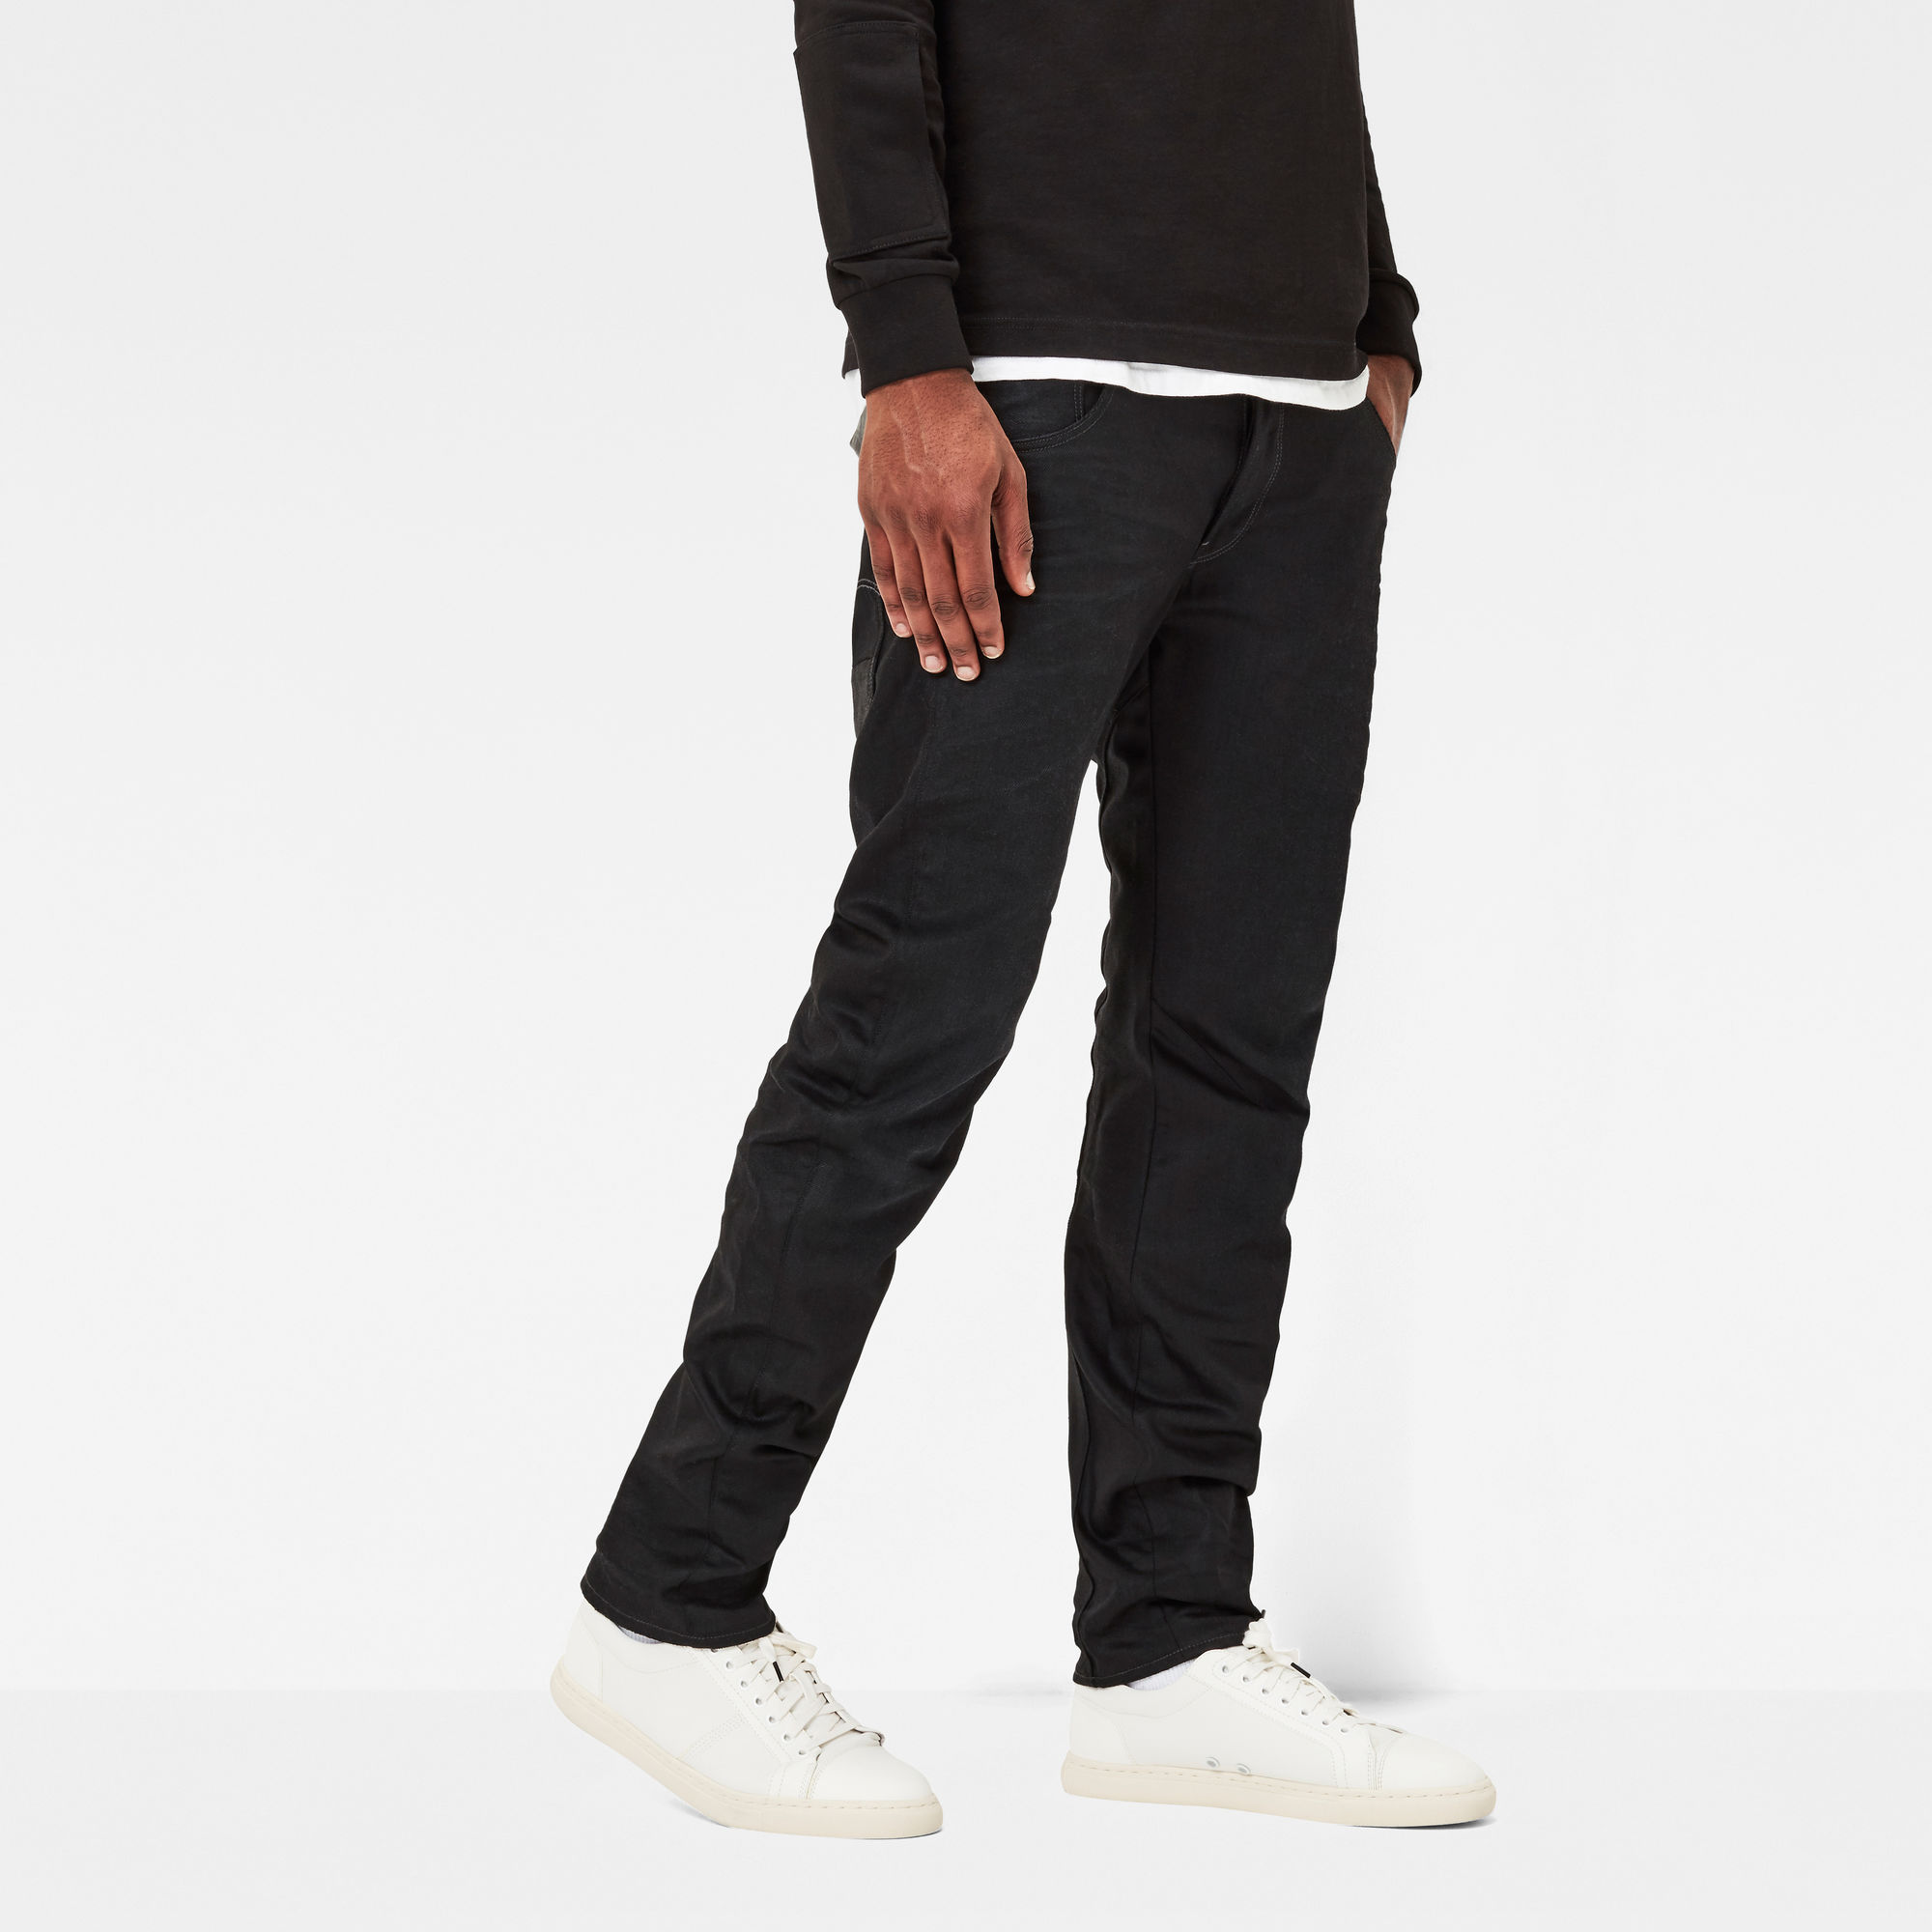 Image of Arc Zip 3D Slim Jeans